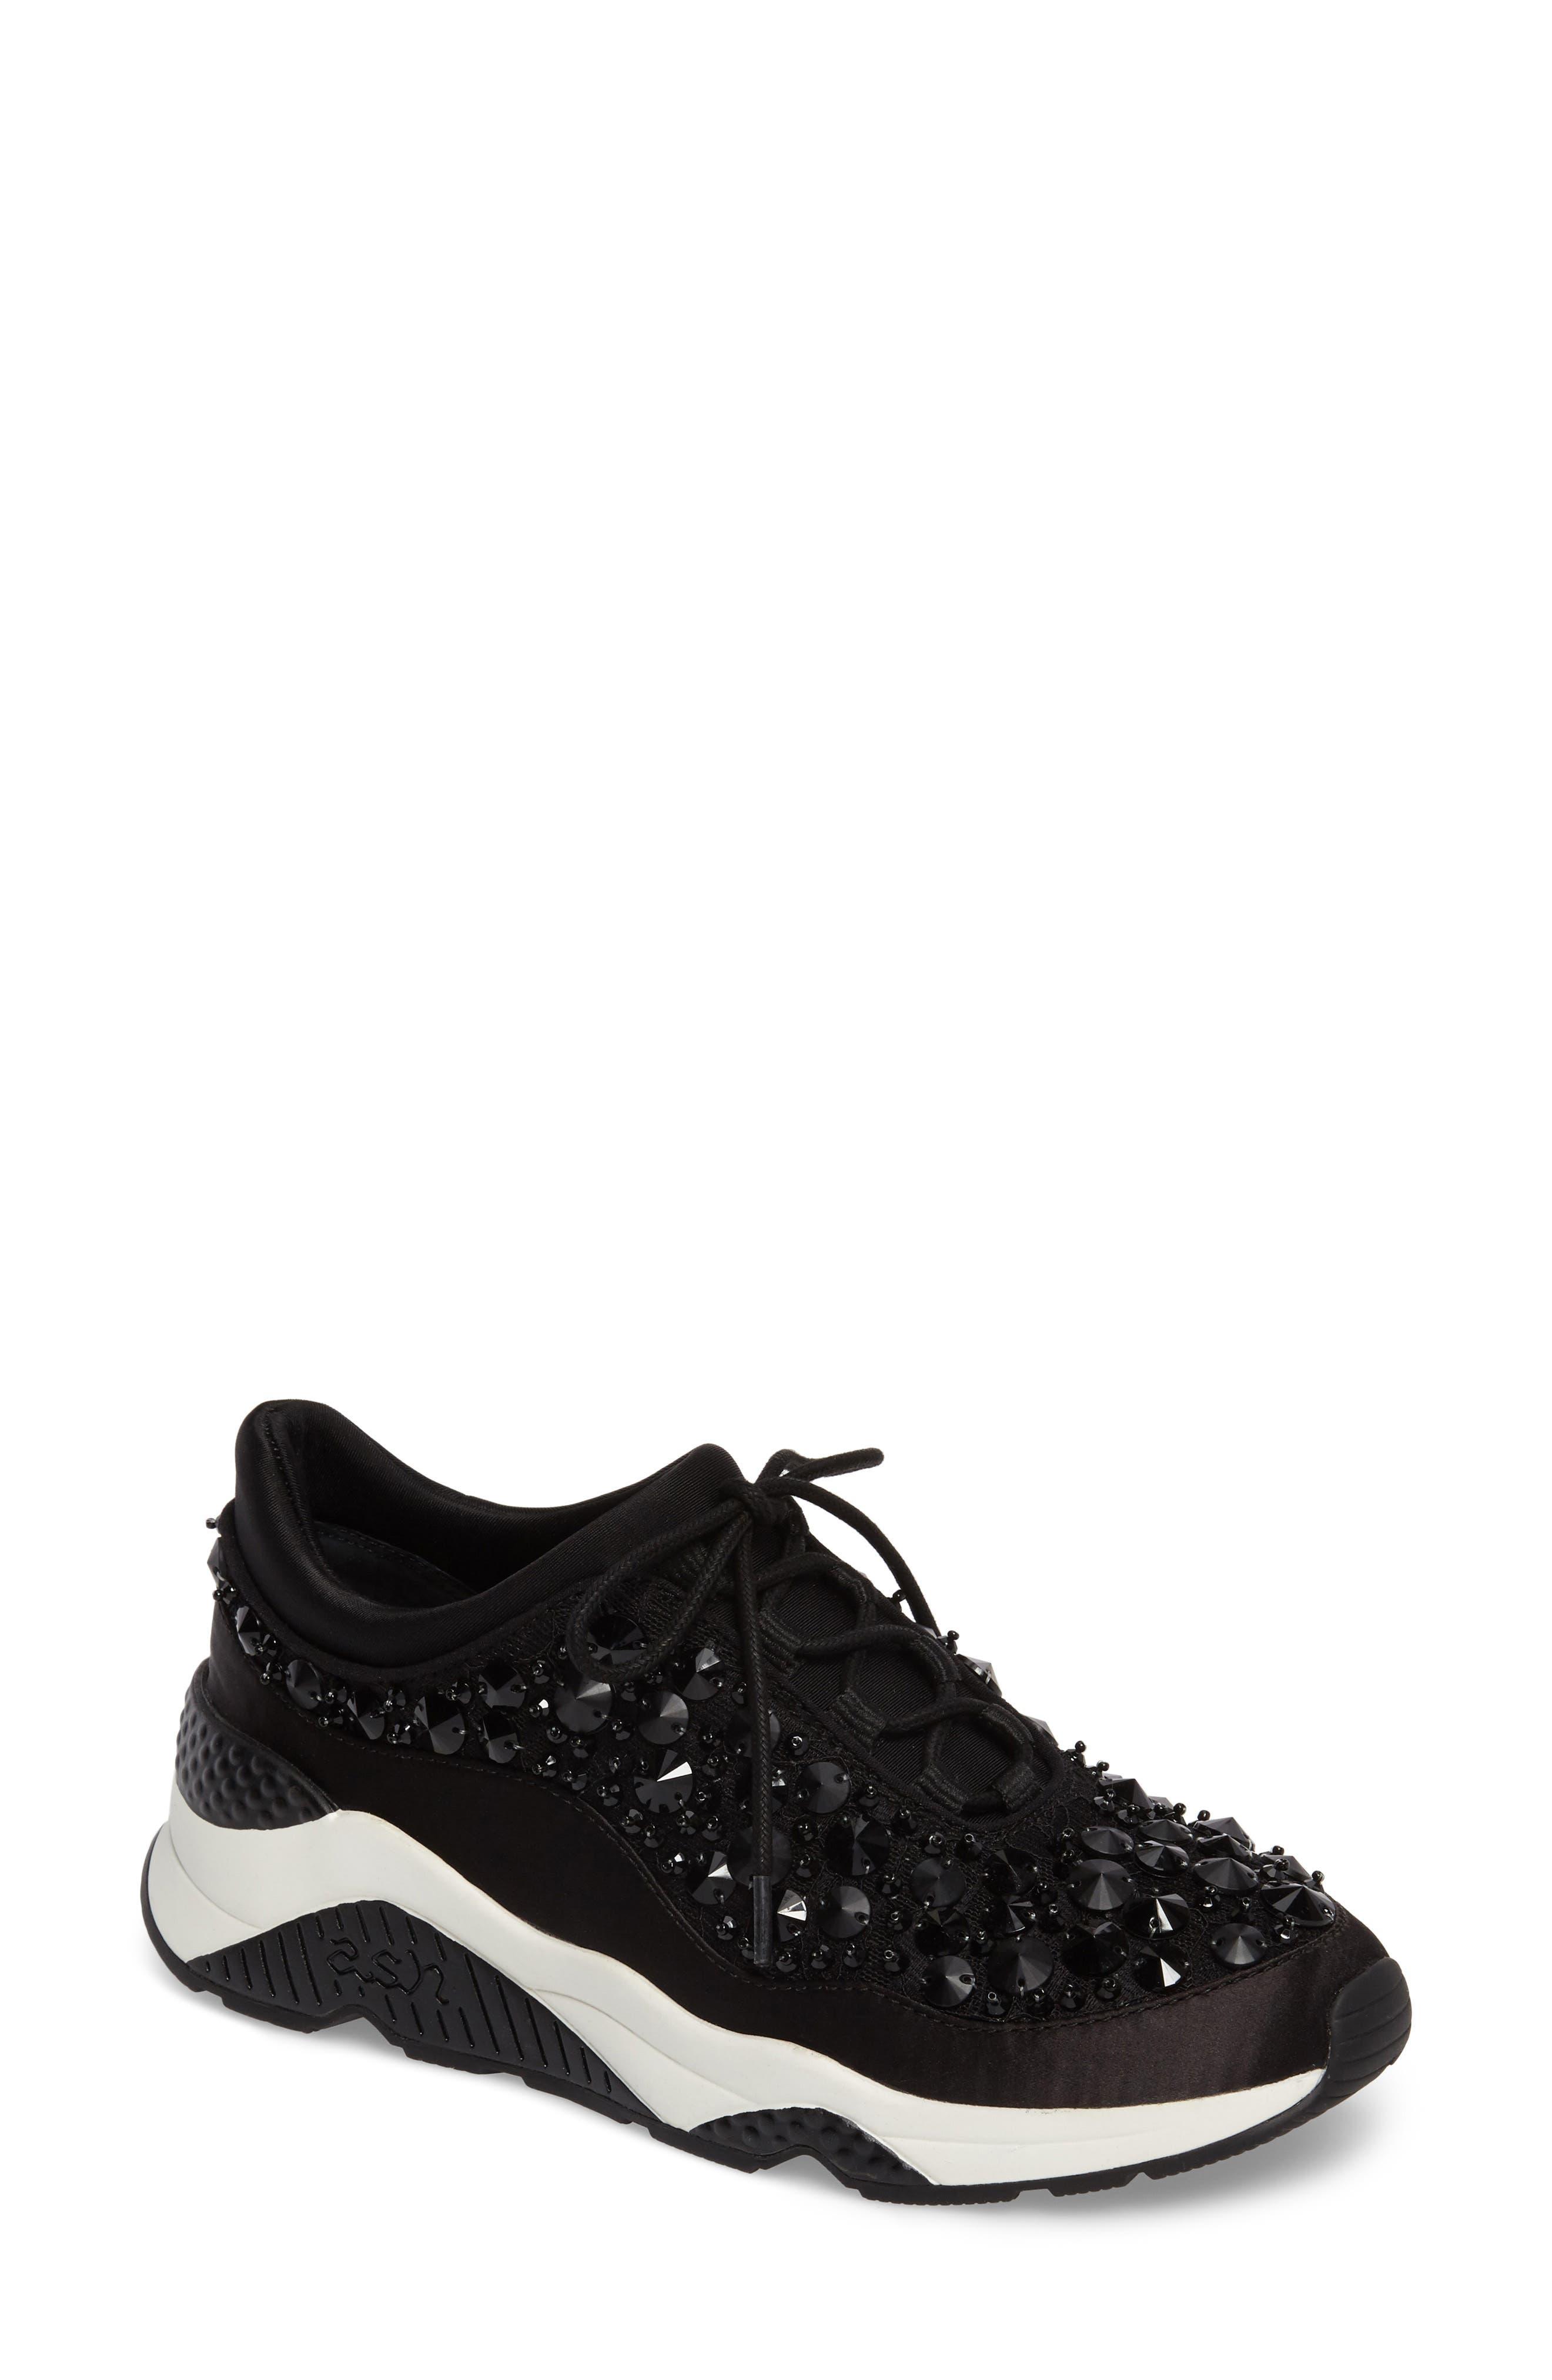 Ash Muse Beads Sneaker (Women)